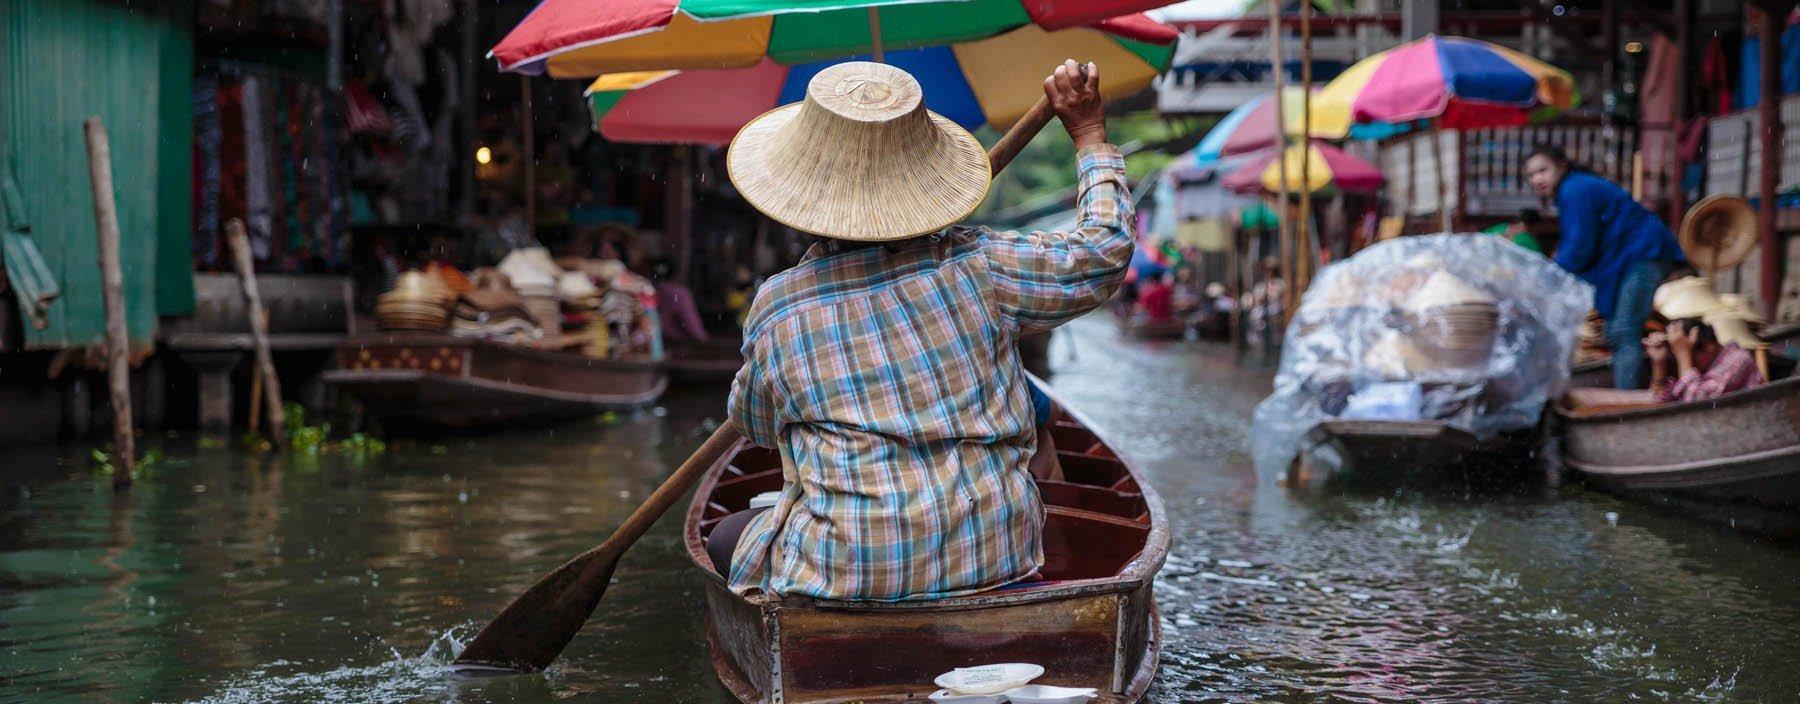 th, bangkok, floating market damnoen saduak (15).jpg